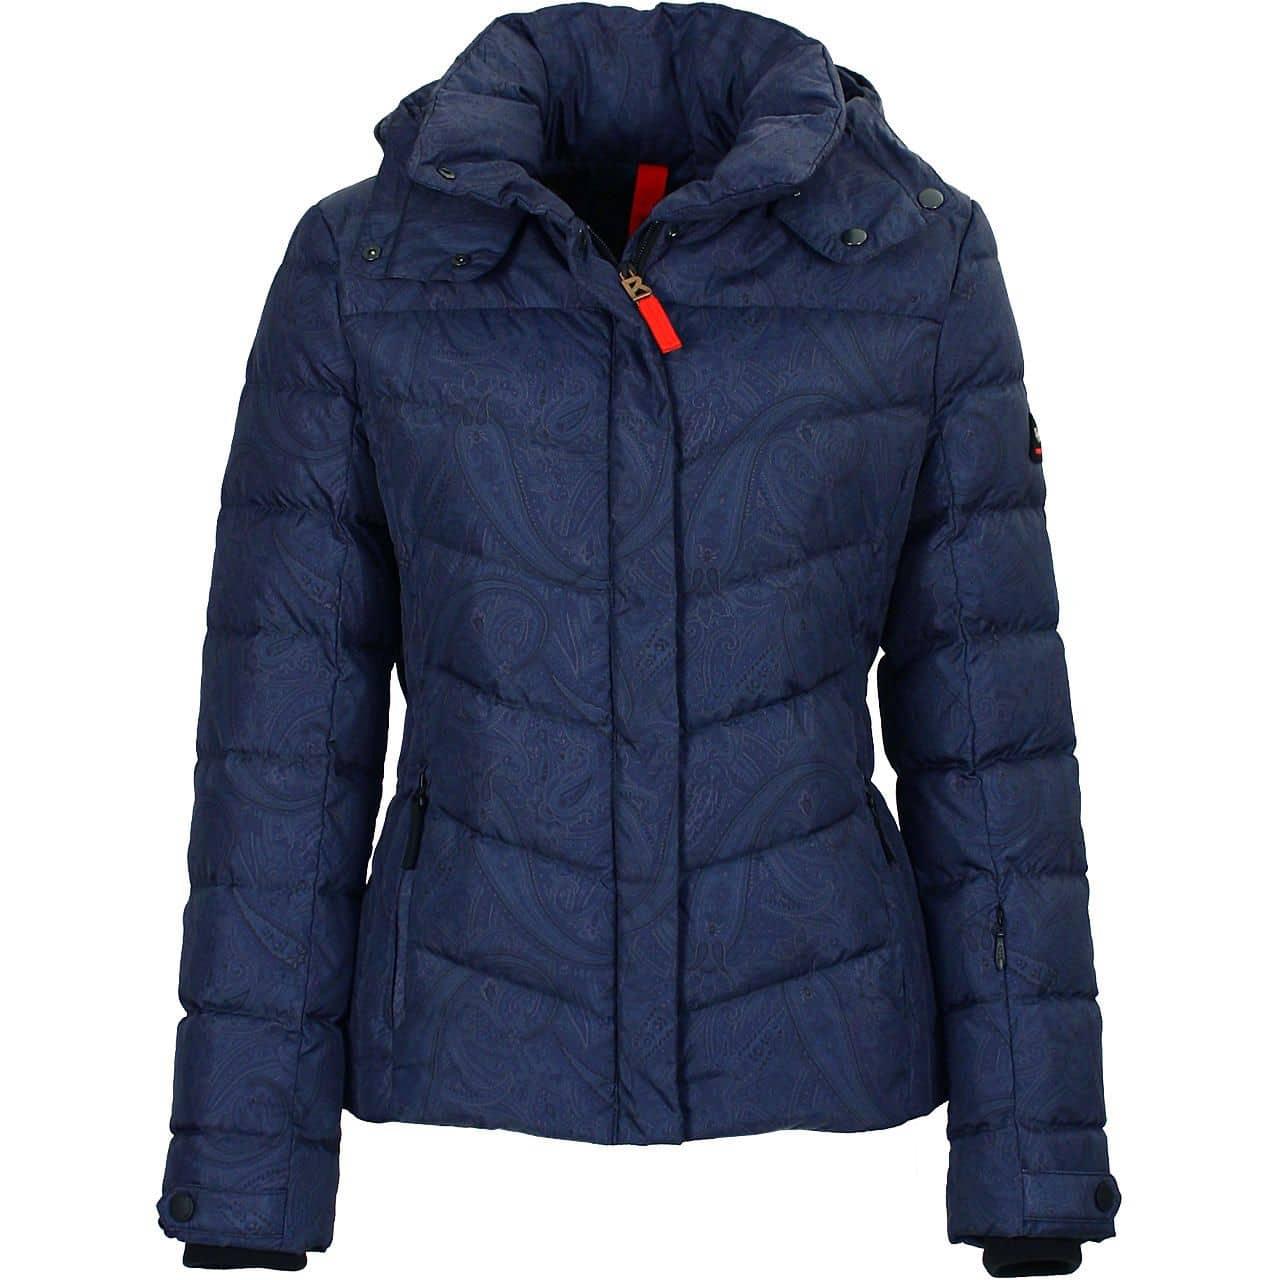 Bogner Fire + Ice Women Down Jacket Sally navy jacquard - 38